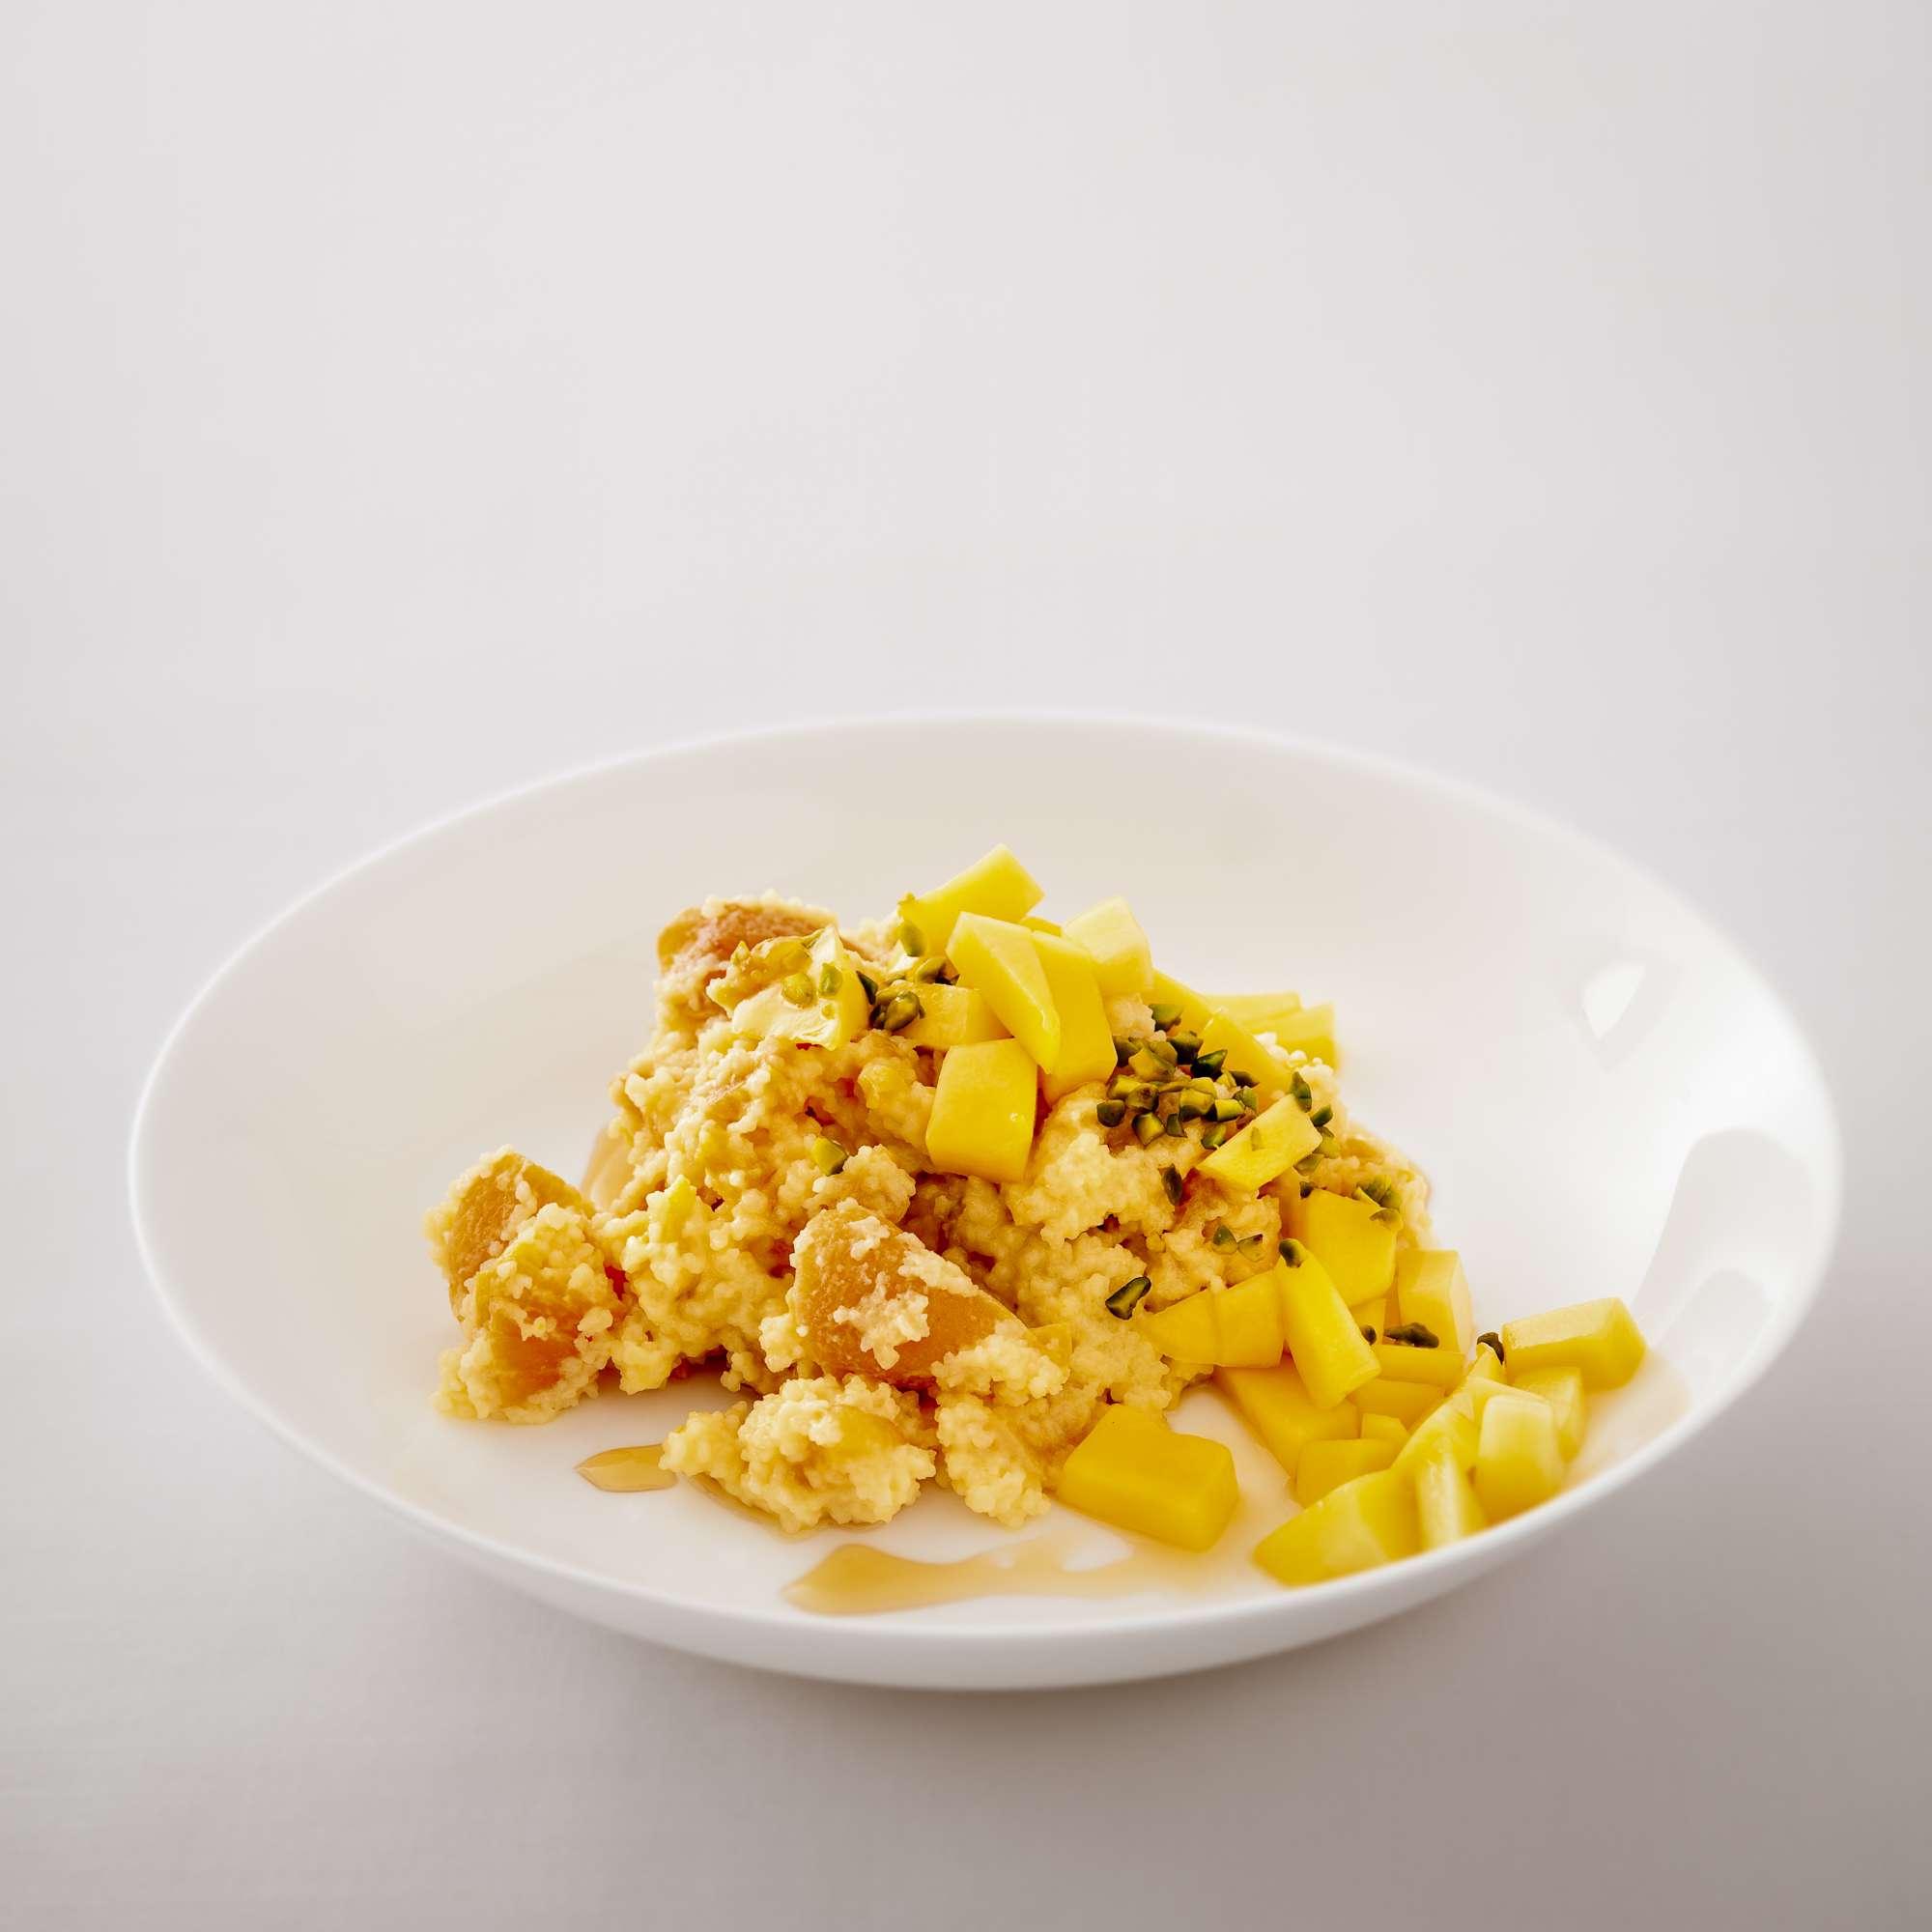 Süßes Orangen-Aprikosen-Couscous mit Mango